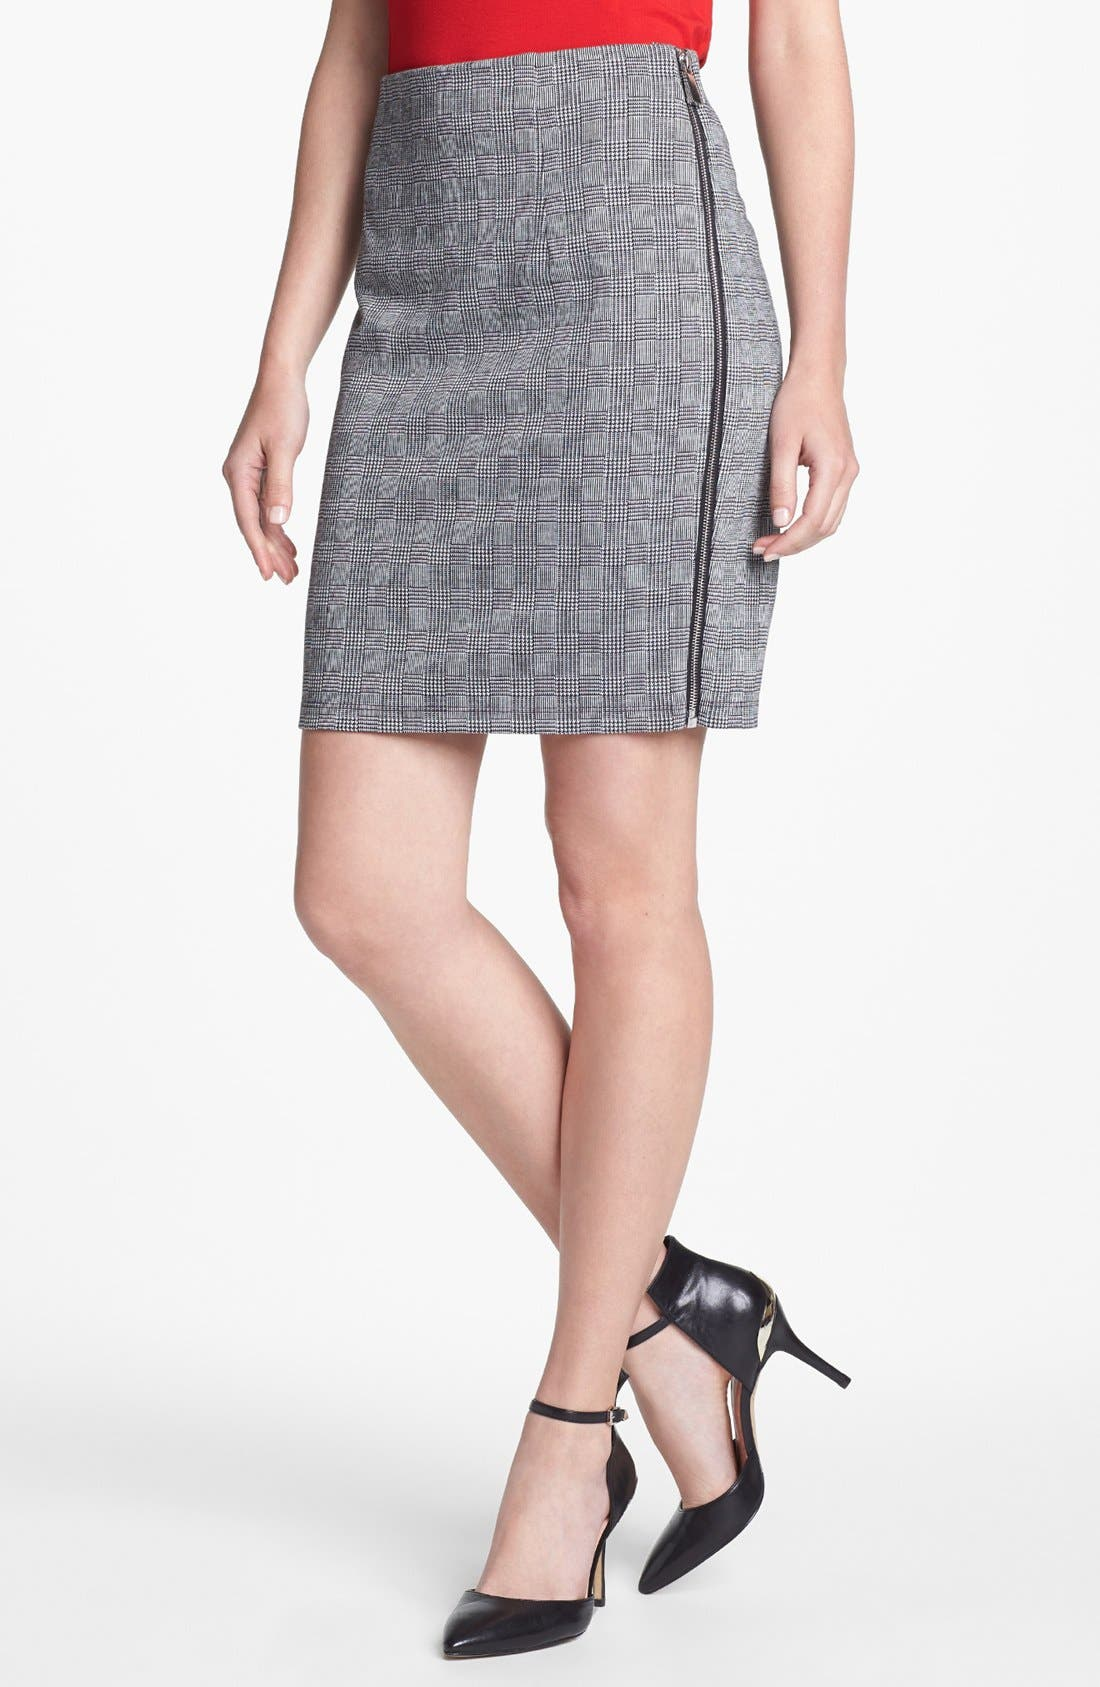 Alternate Image 1 Selected - Vince Camuto Side Zip Glen Plaid Pencil Skirt (Petite) (Nordstrom Exclusive)